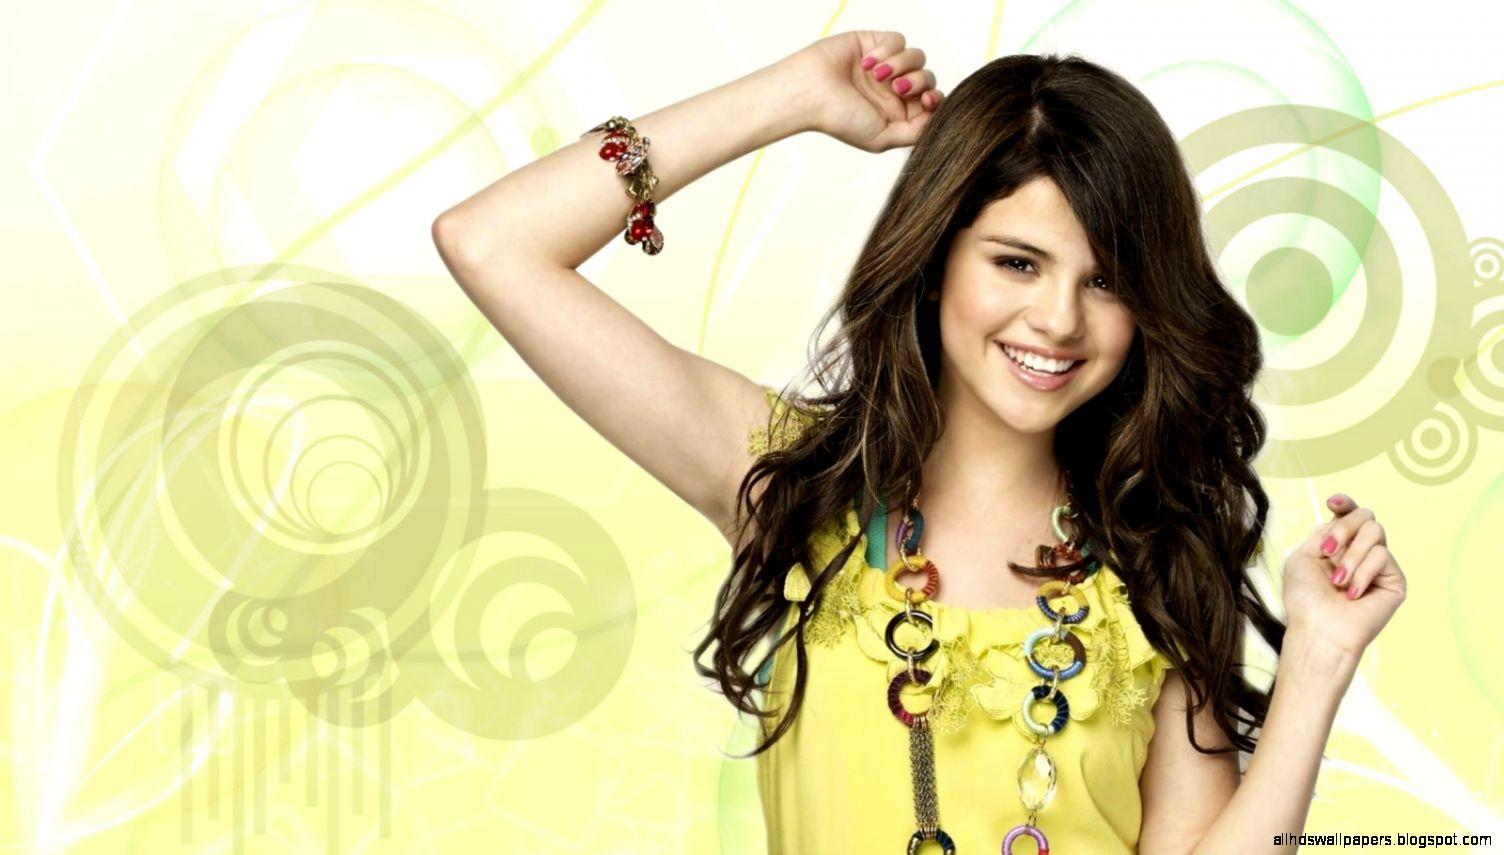 Beautiful Selena Gomez Wallpapers HD Free